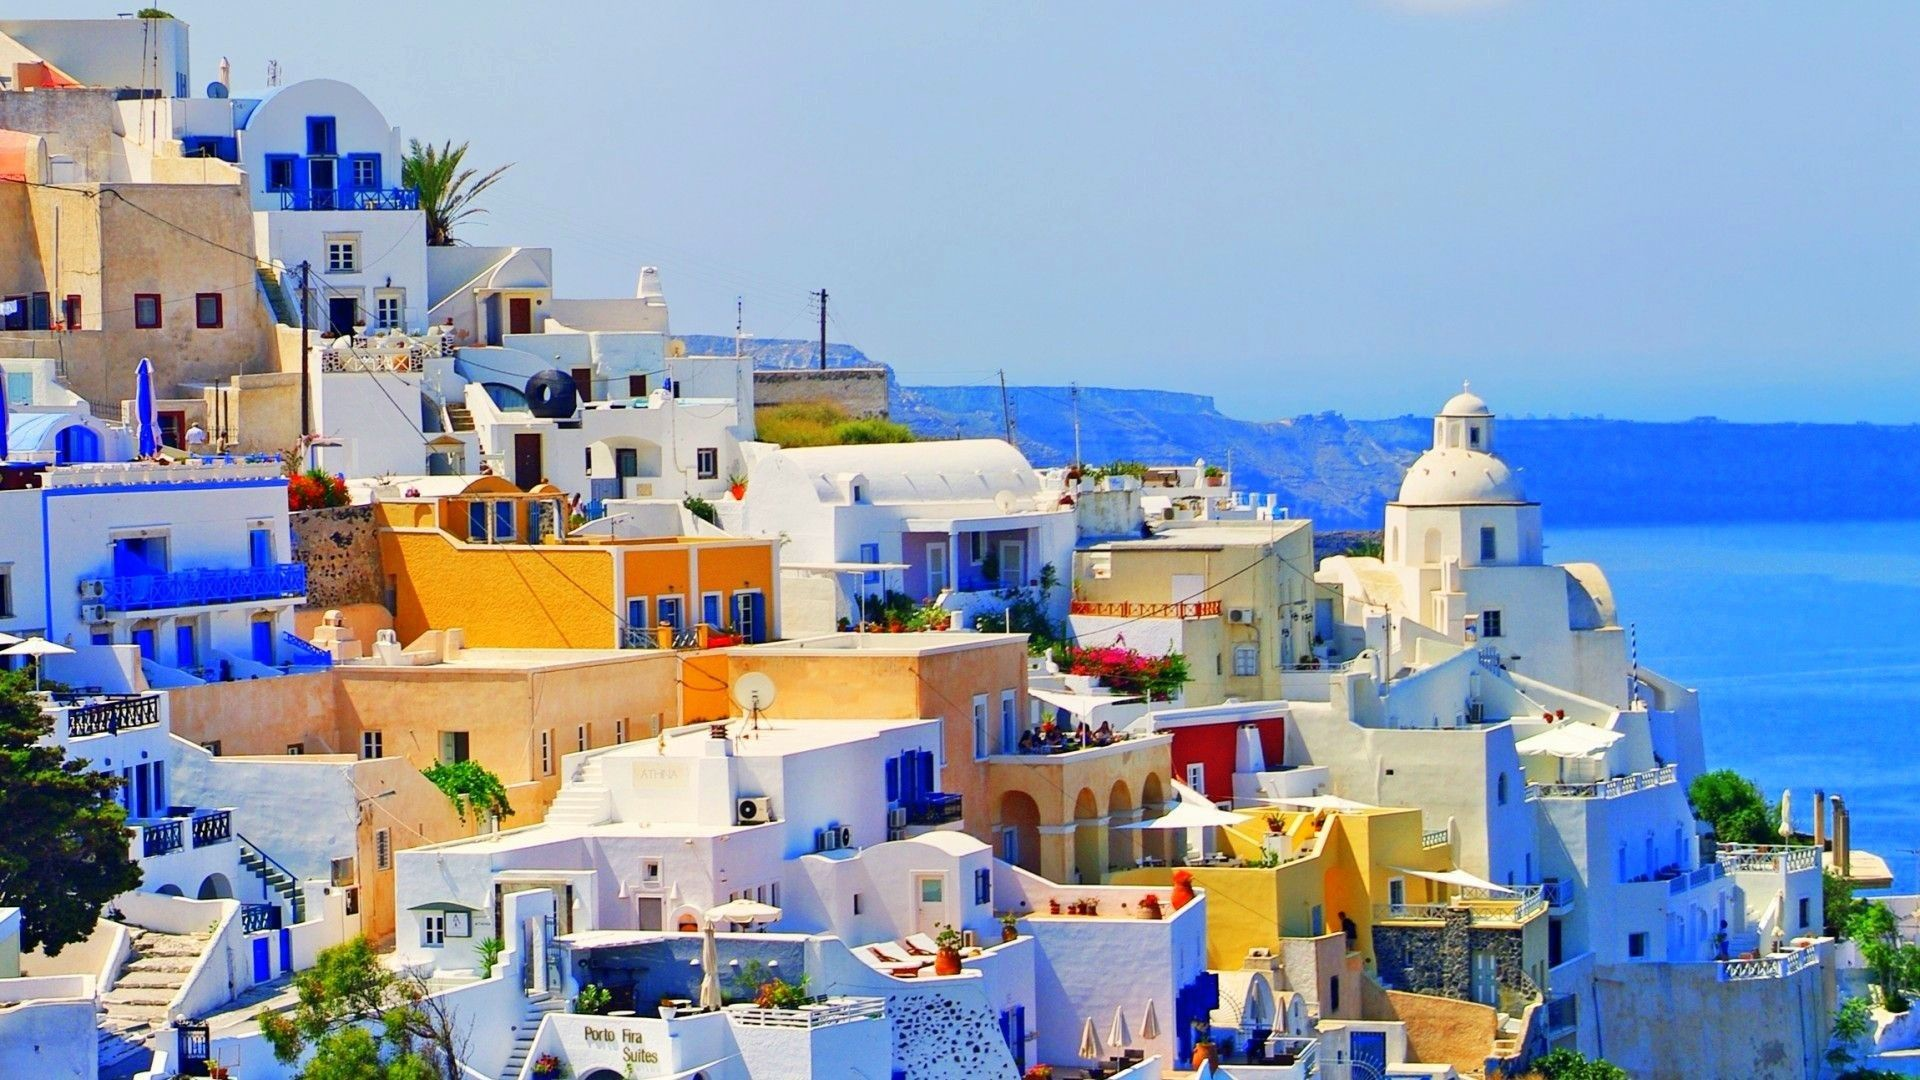 Santorini Full HD Wallpaper